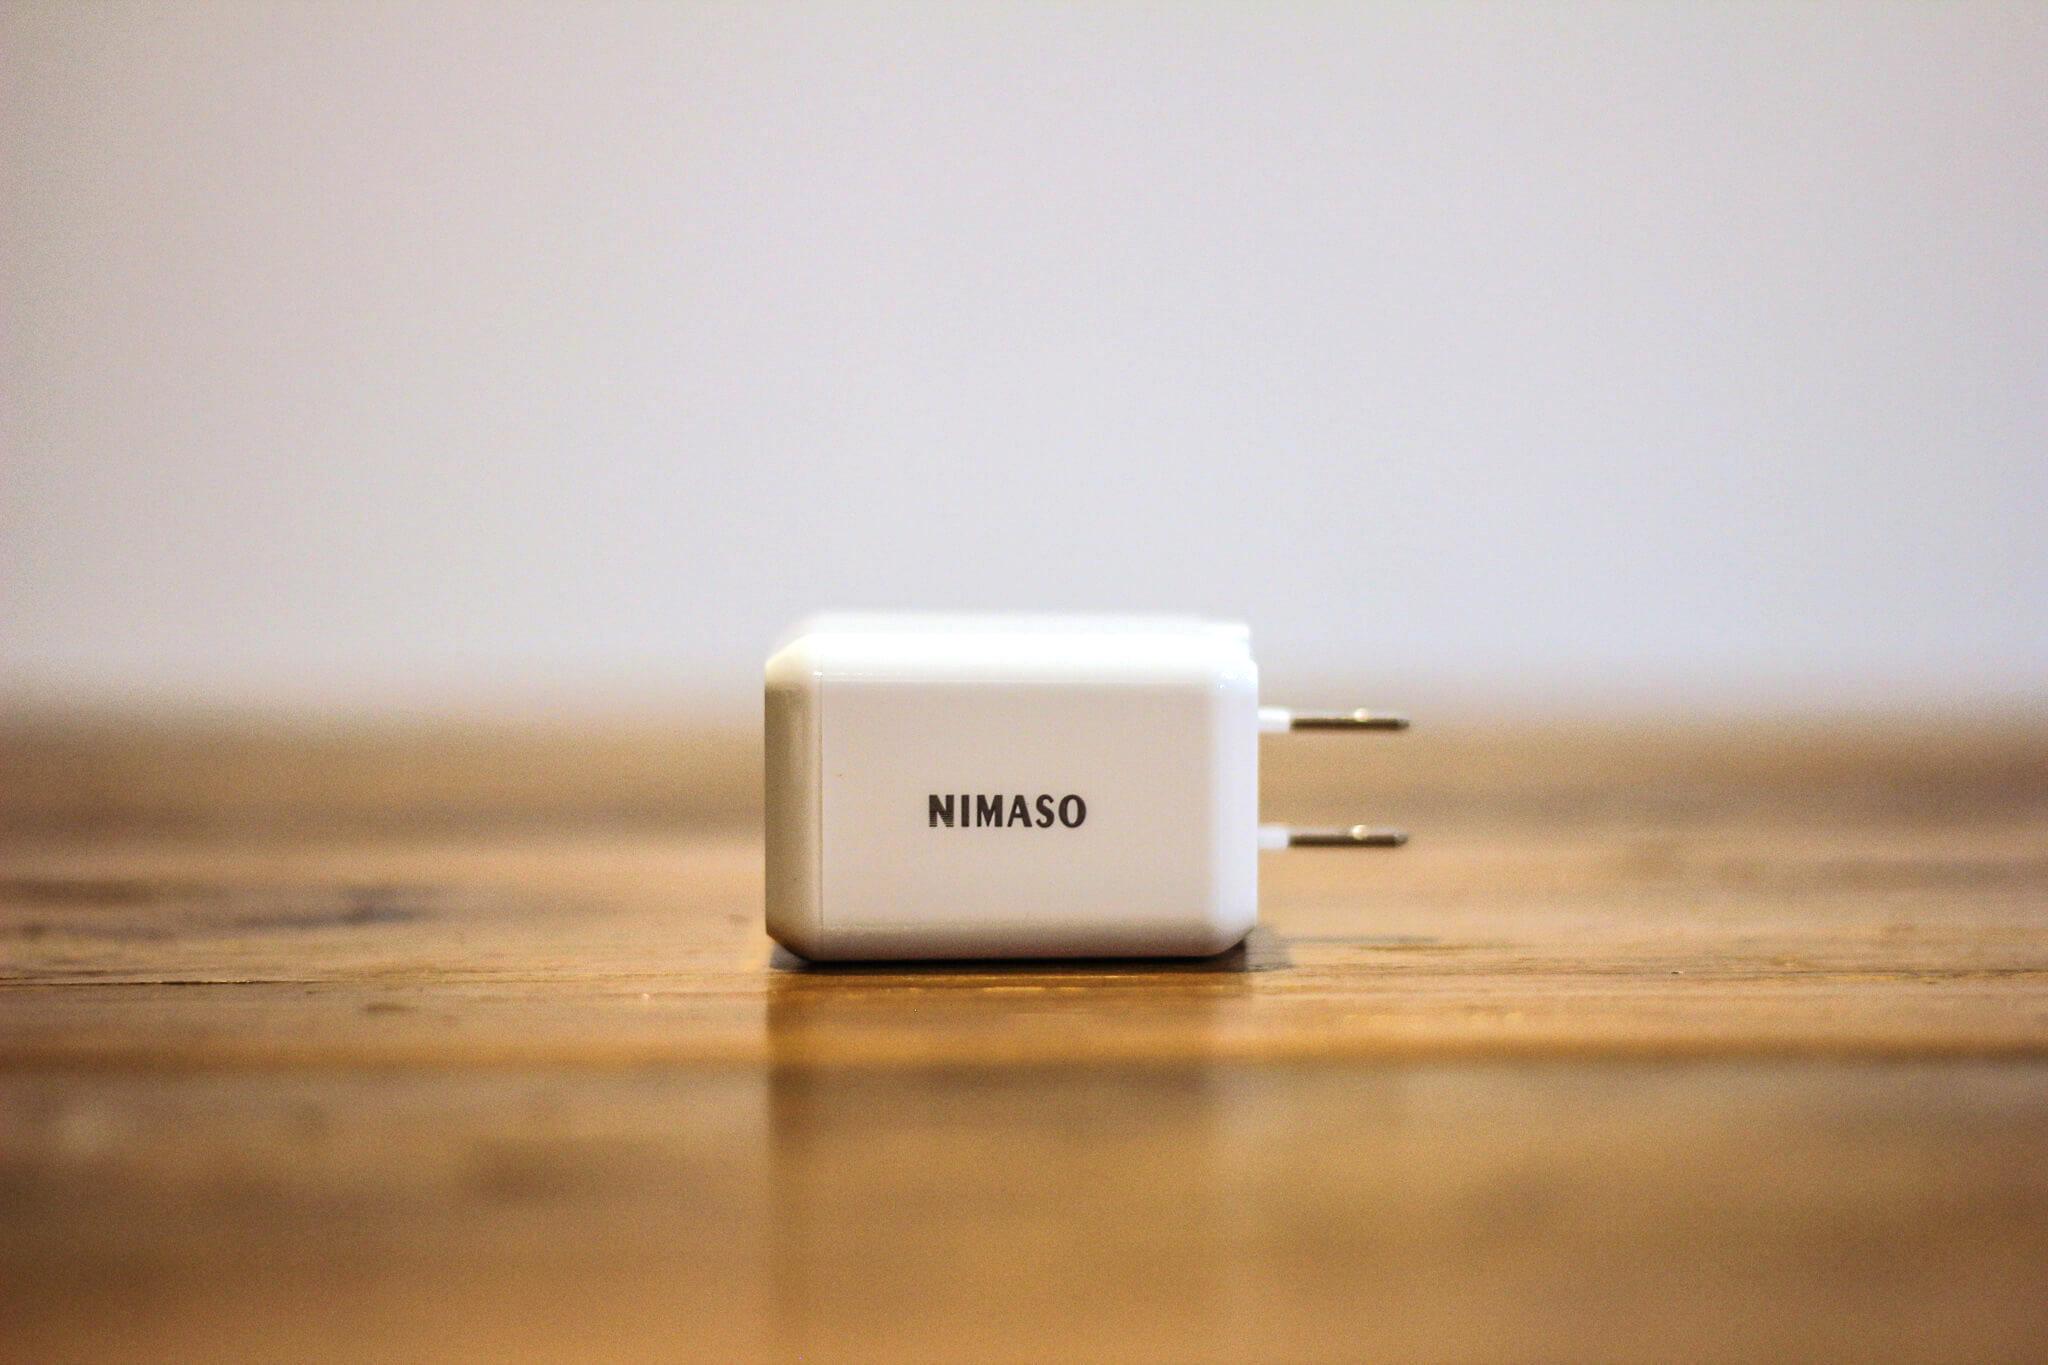 Nimaso 充電機器 アダプター 本体